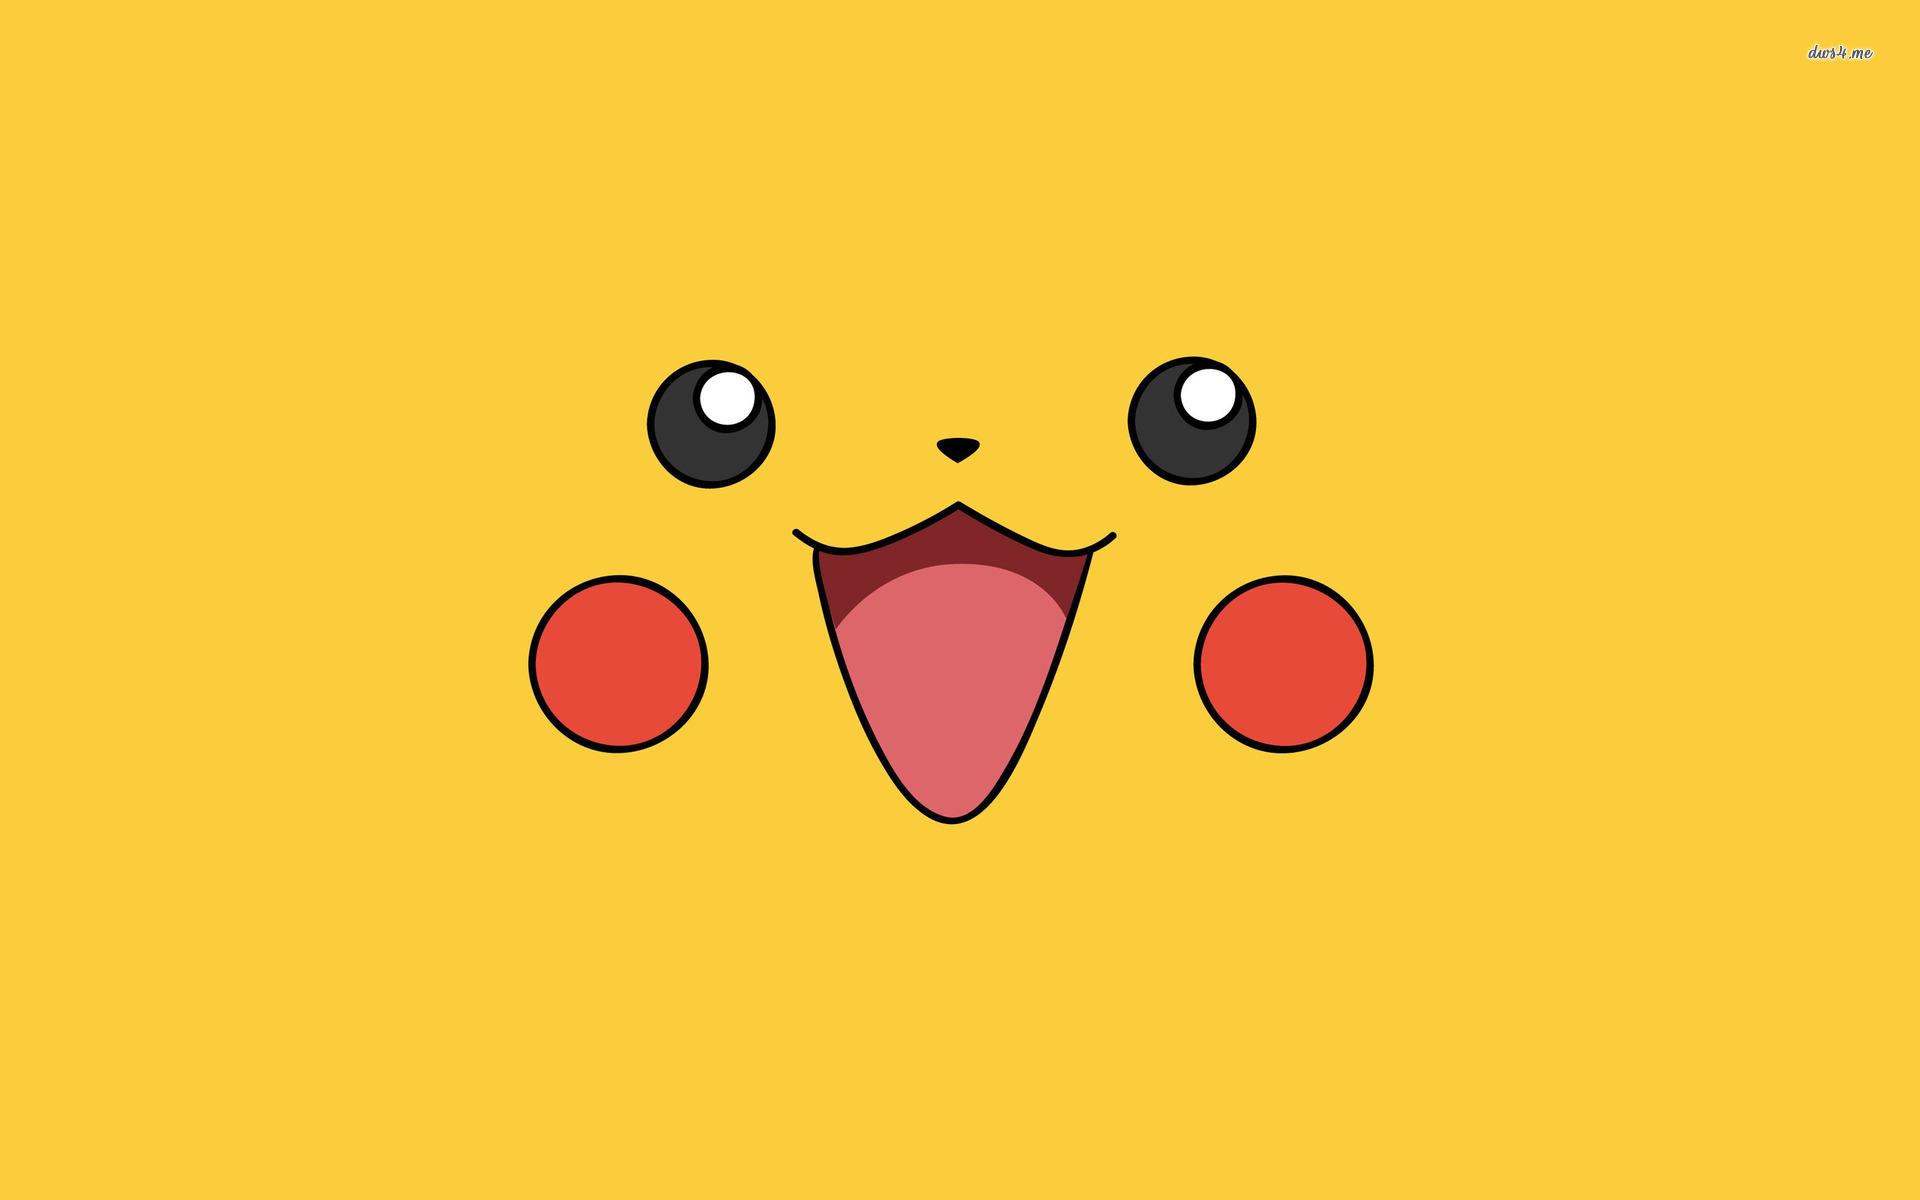 Pikachu wallpaper   Anime wallpapers   14675 1920x1200